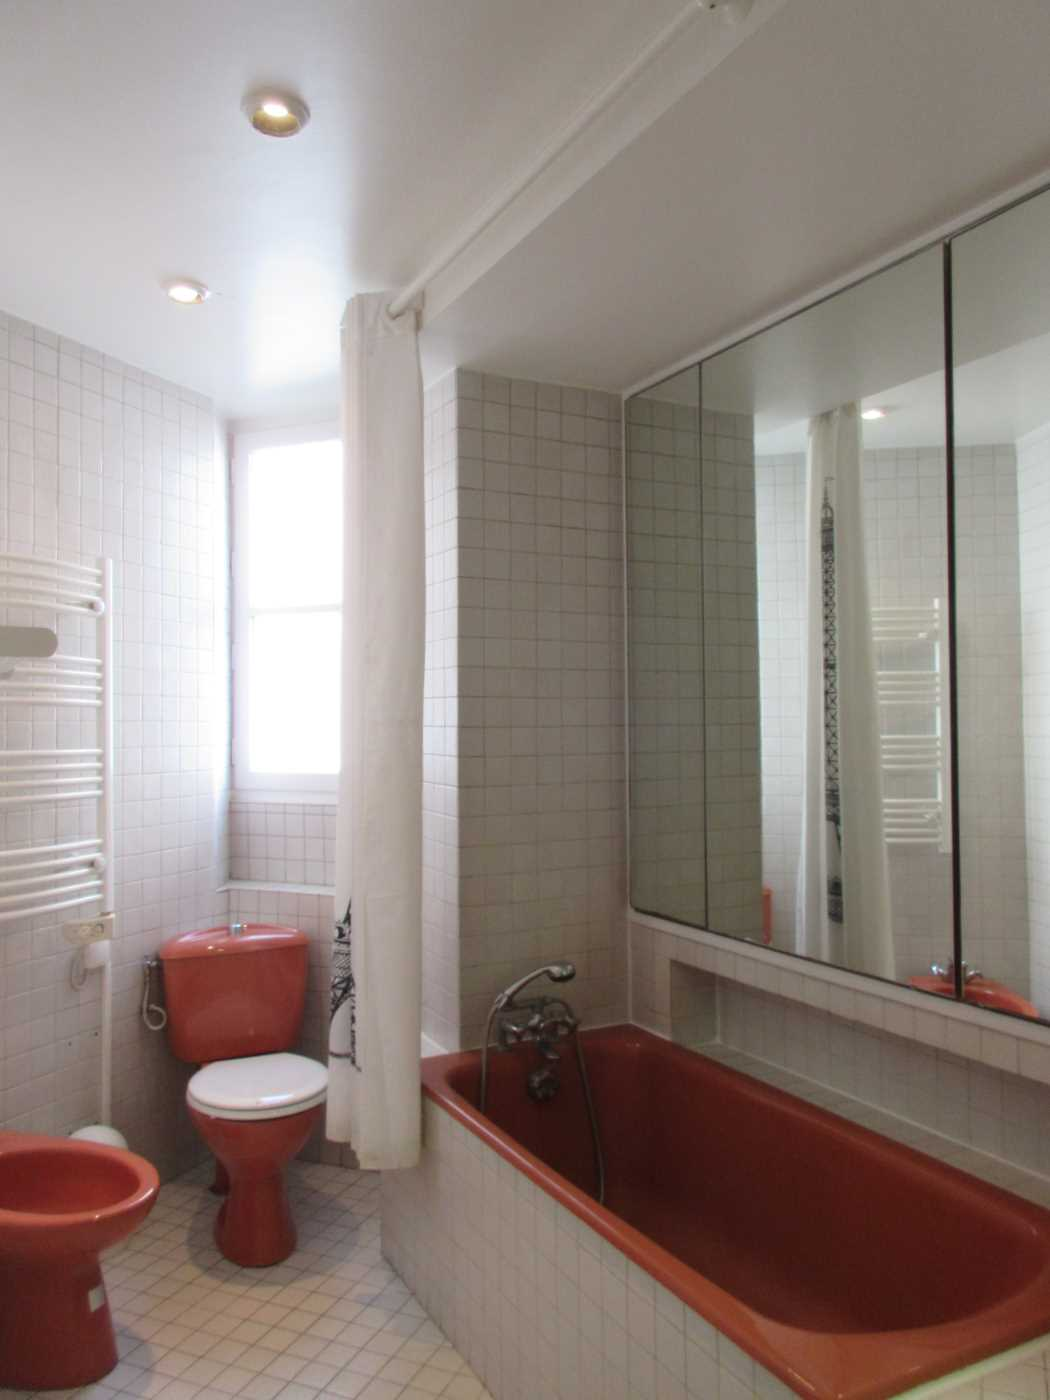 location appartement meubl paris 5 cattalan johnson immobilier. Black Bedroom Furniture Sets. Home Design Ideas